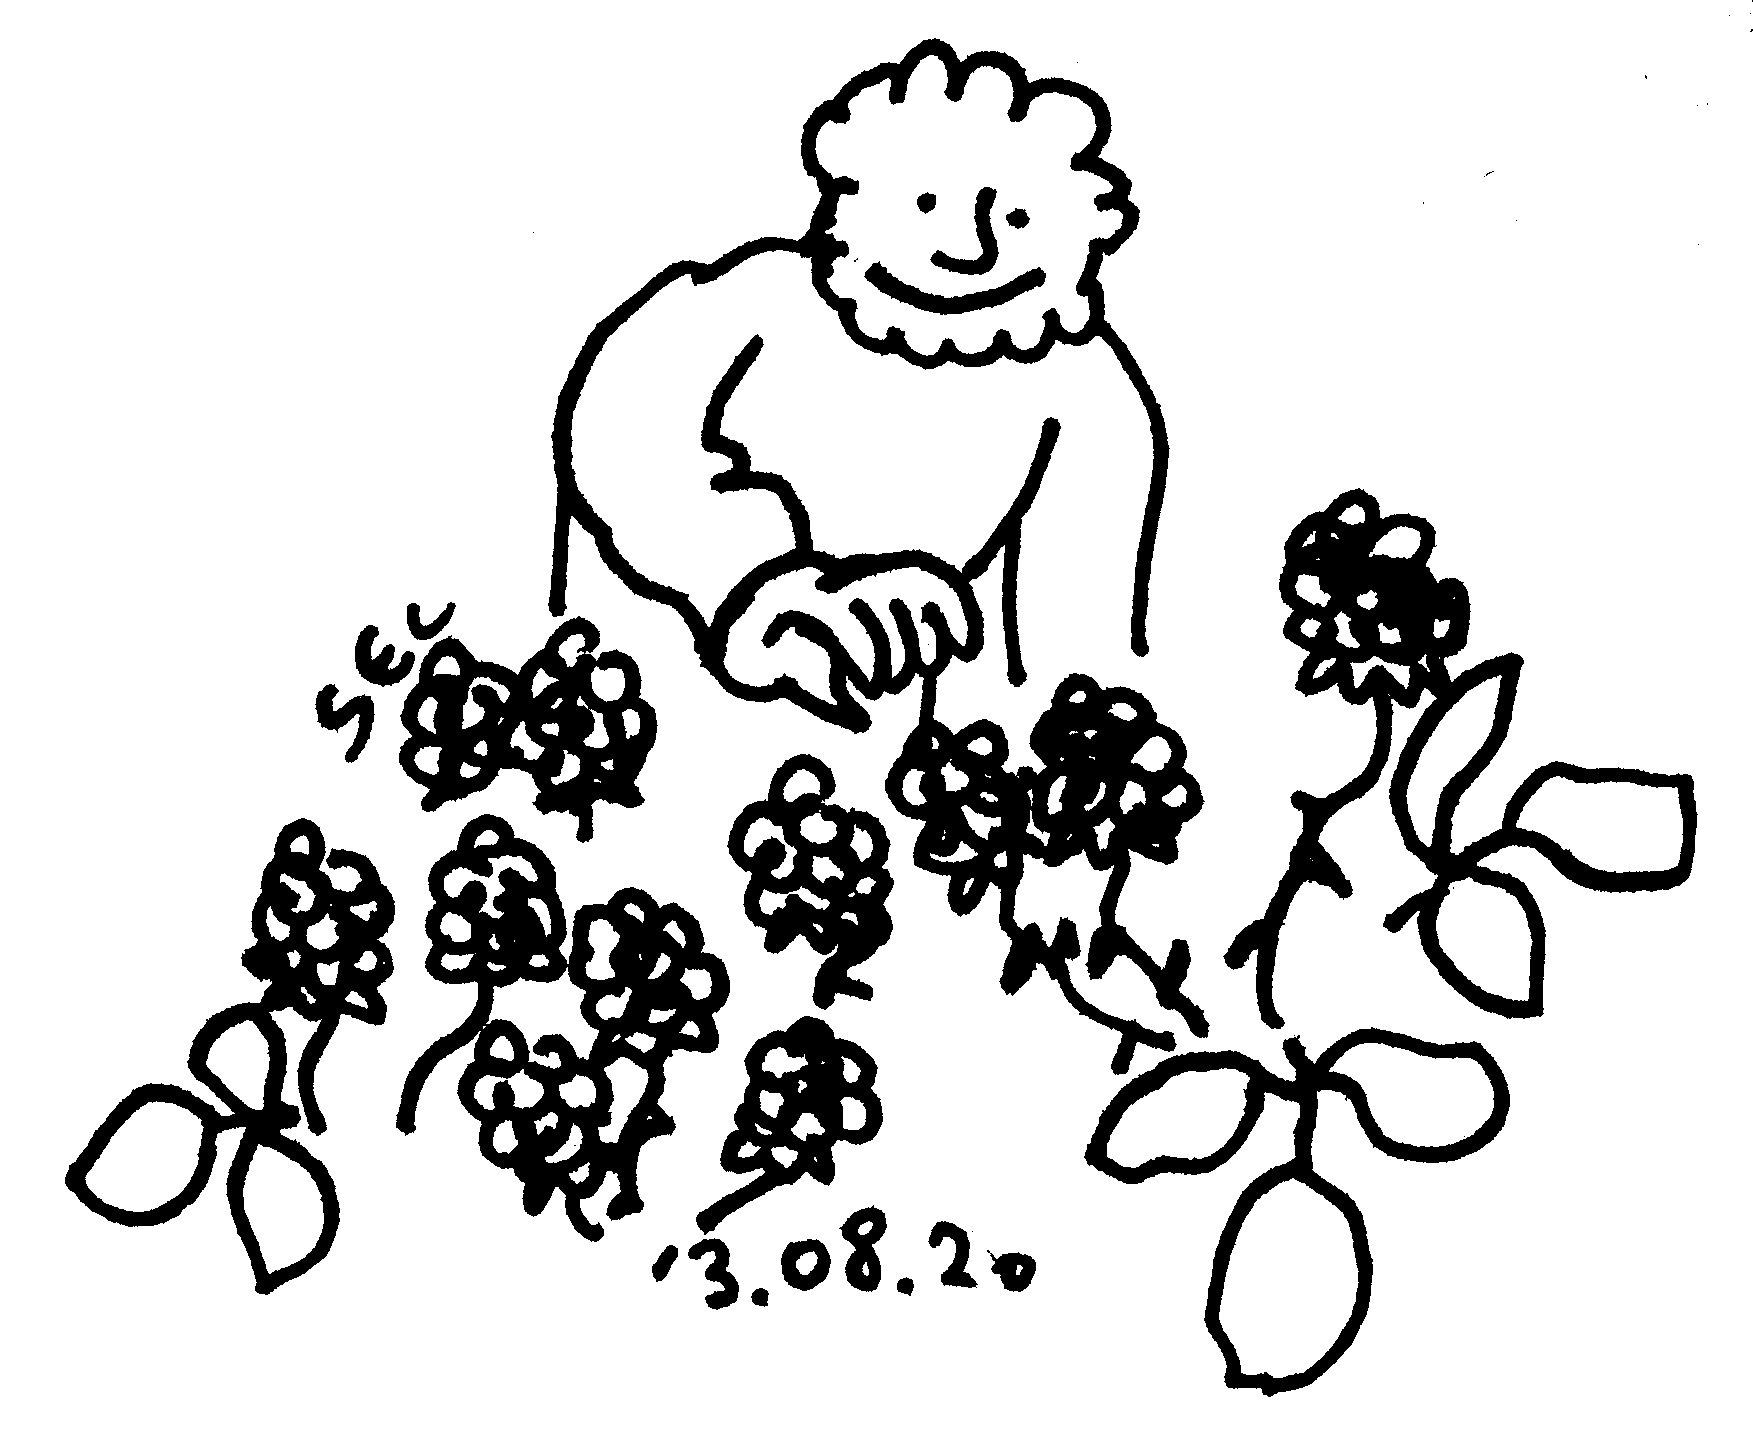 13_08_20_121